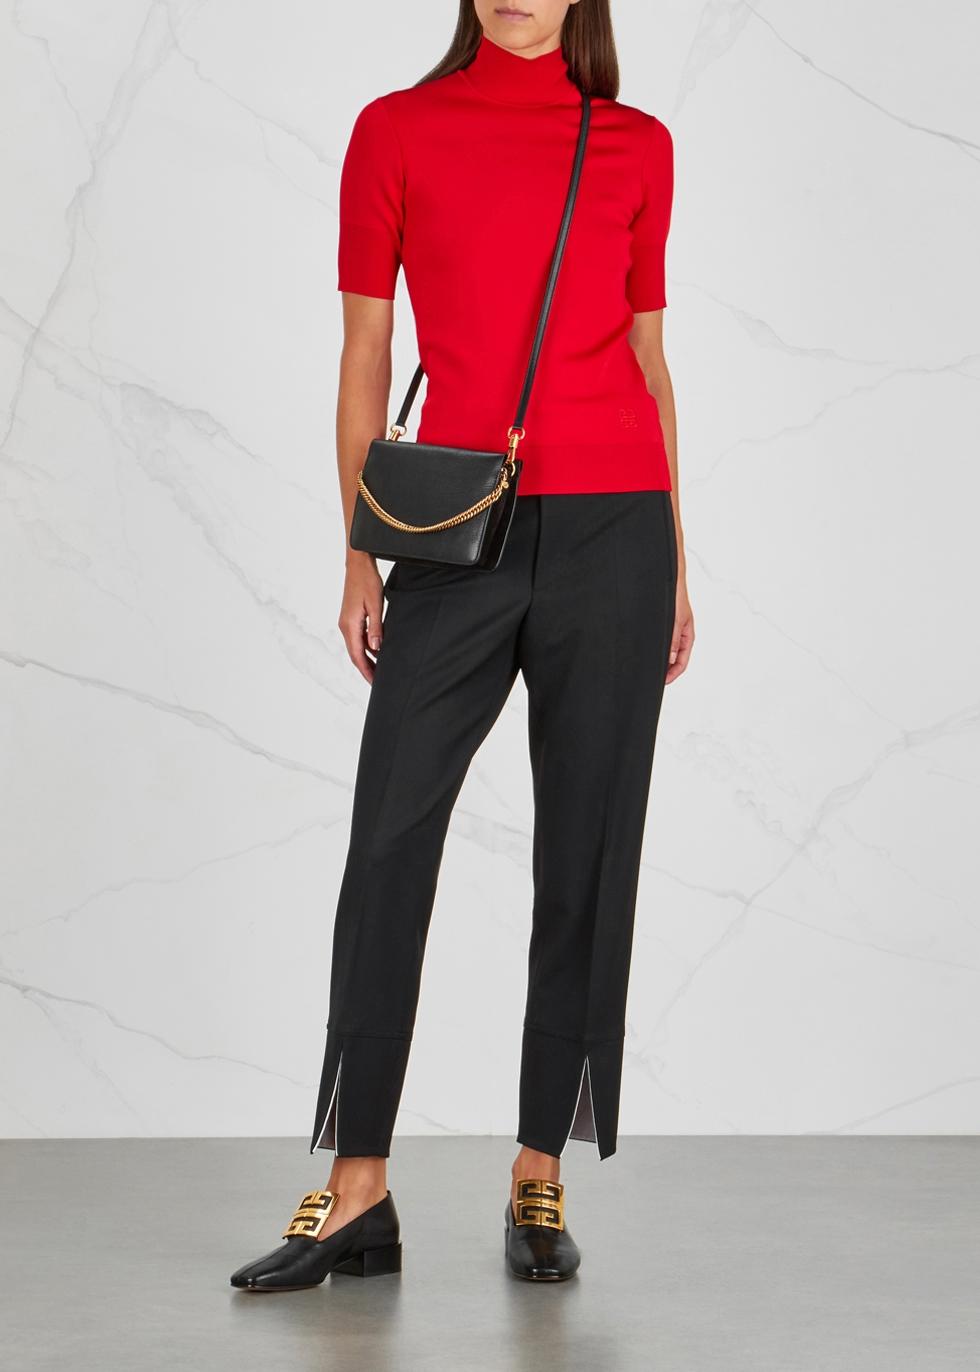 Givenchy - Designer Clothing 74224bbe4ee38